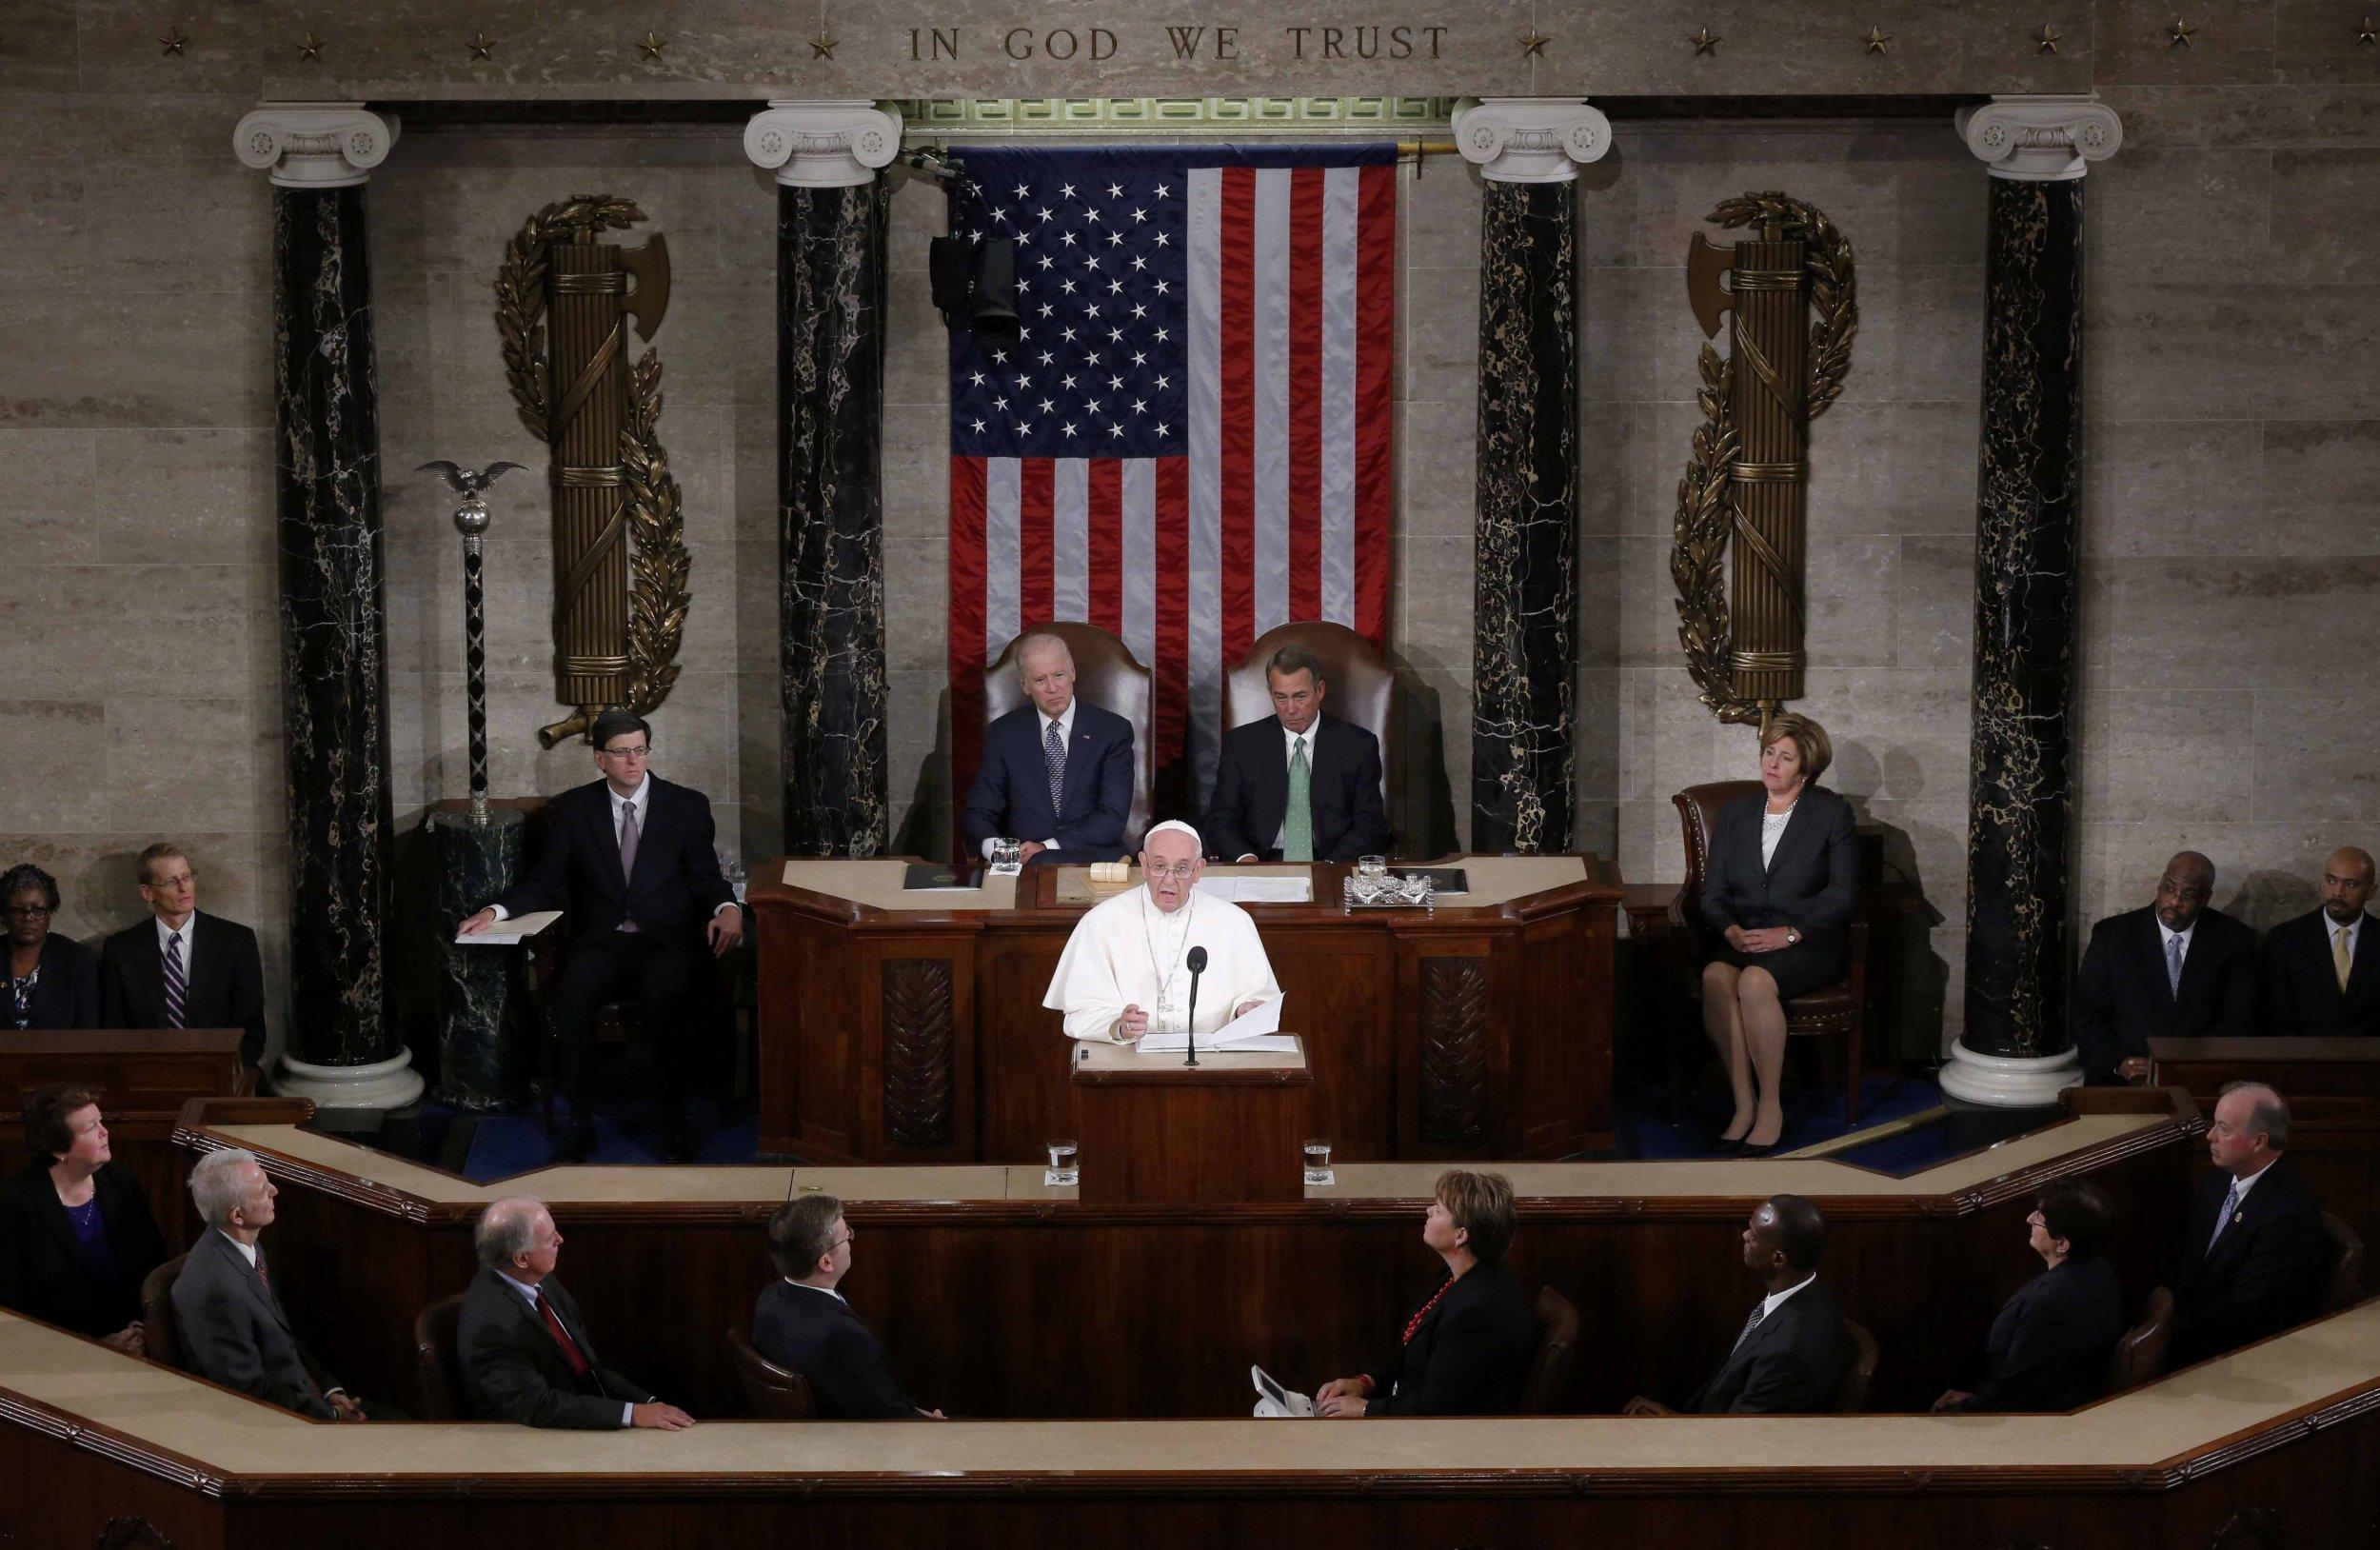 09_24_Pope-Congress_08